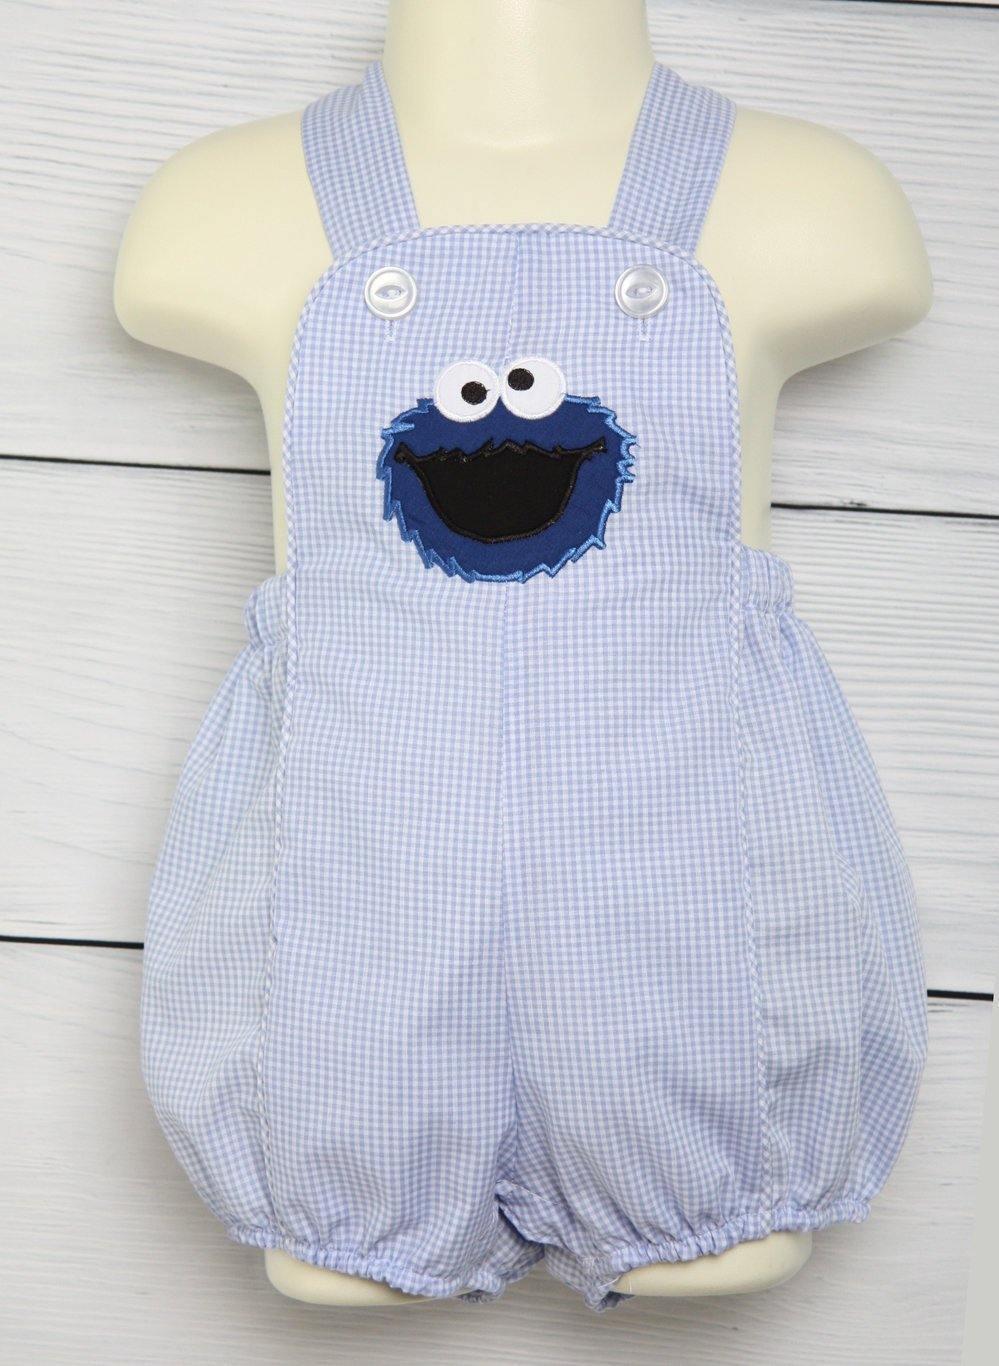 1st Birthday Outfit Baby Boy First Birthday Outfit 1st Birthday Outfit Boy Zuli Kids2